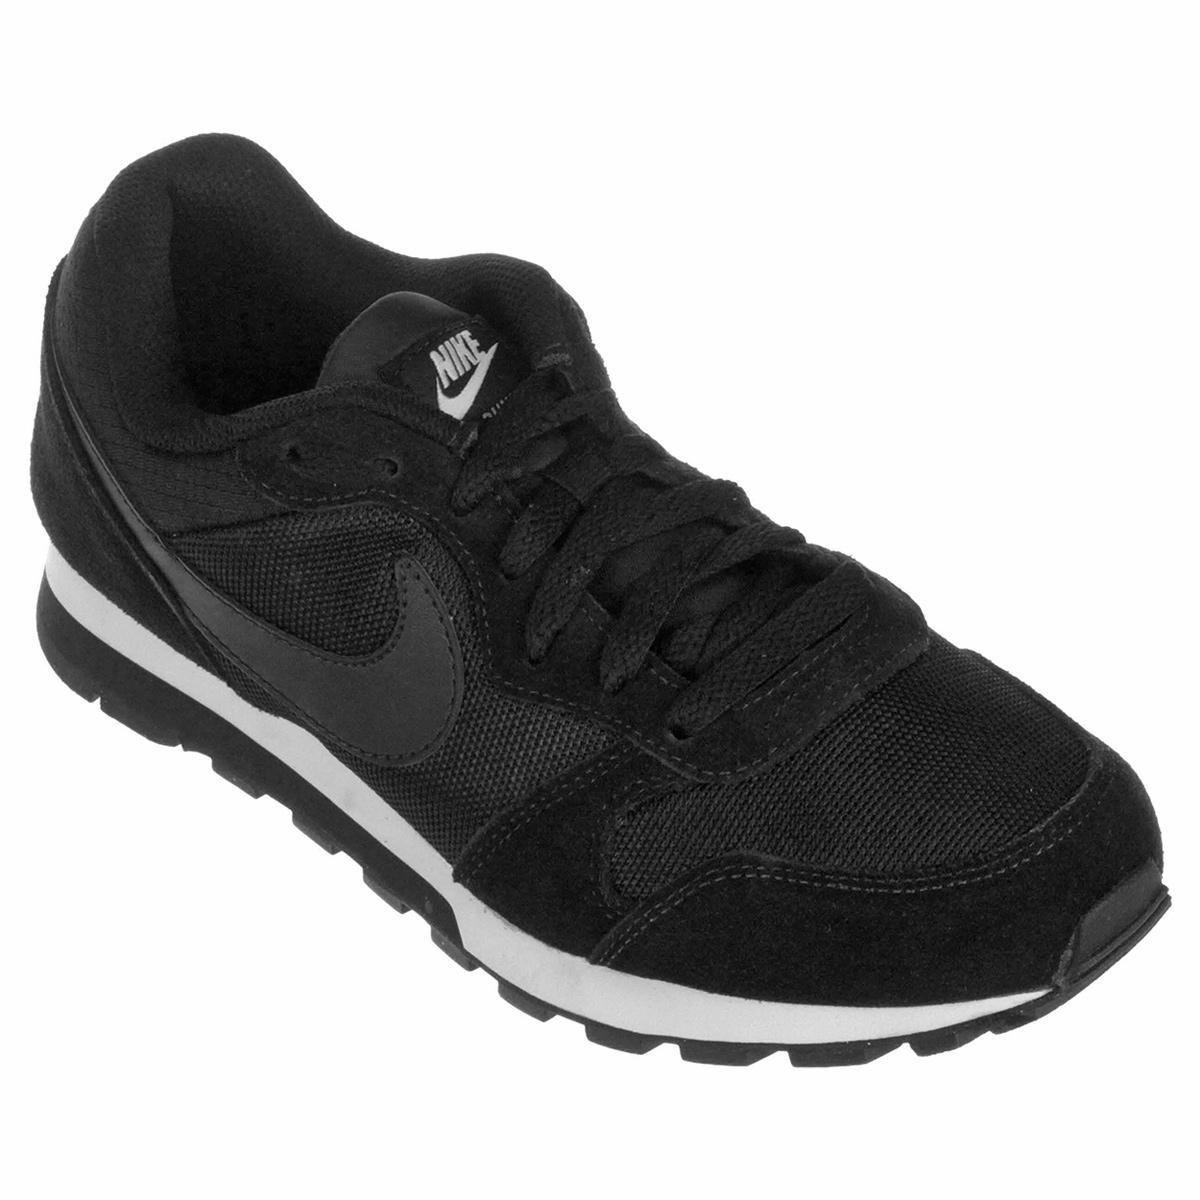 b3dc8acb6 Tênis Nike Md Runner 2 Feminino - Preto e Branco - Compre Agora ...